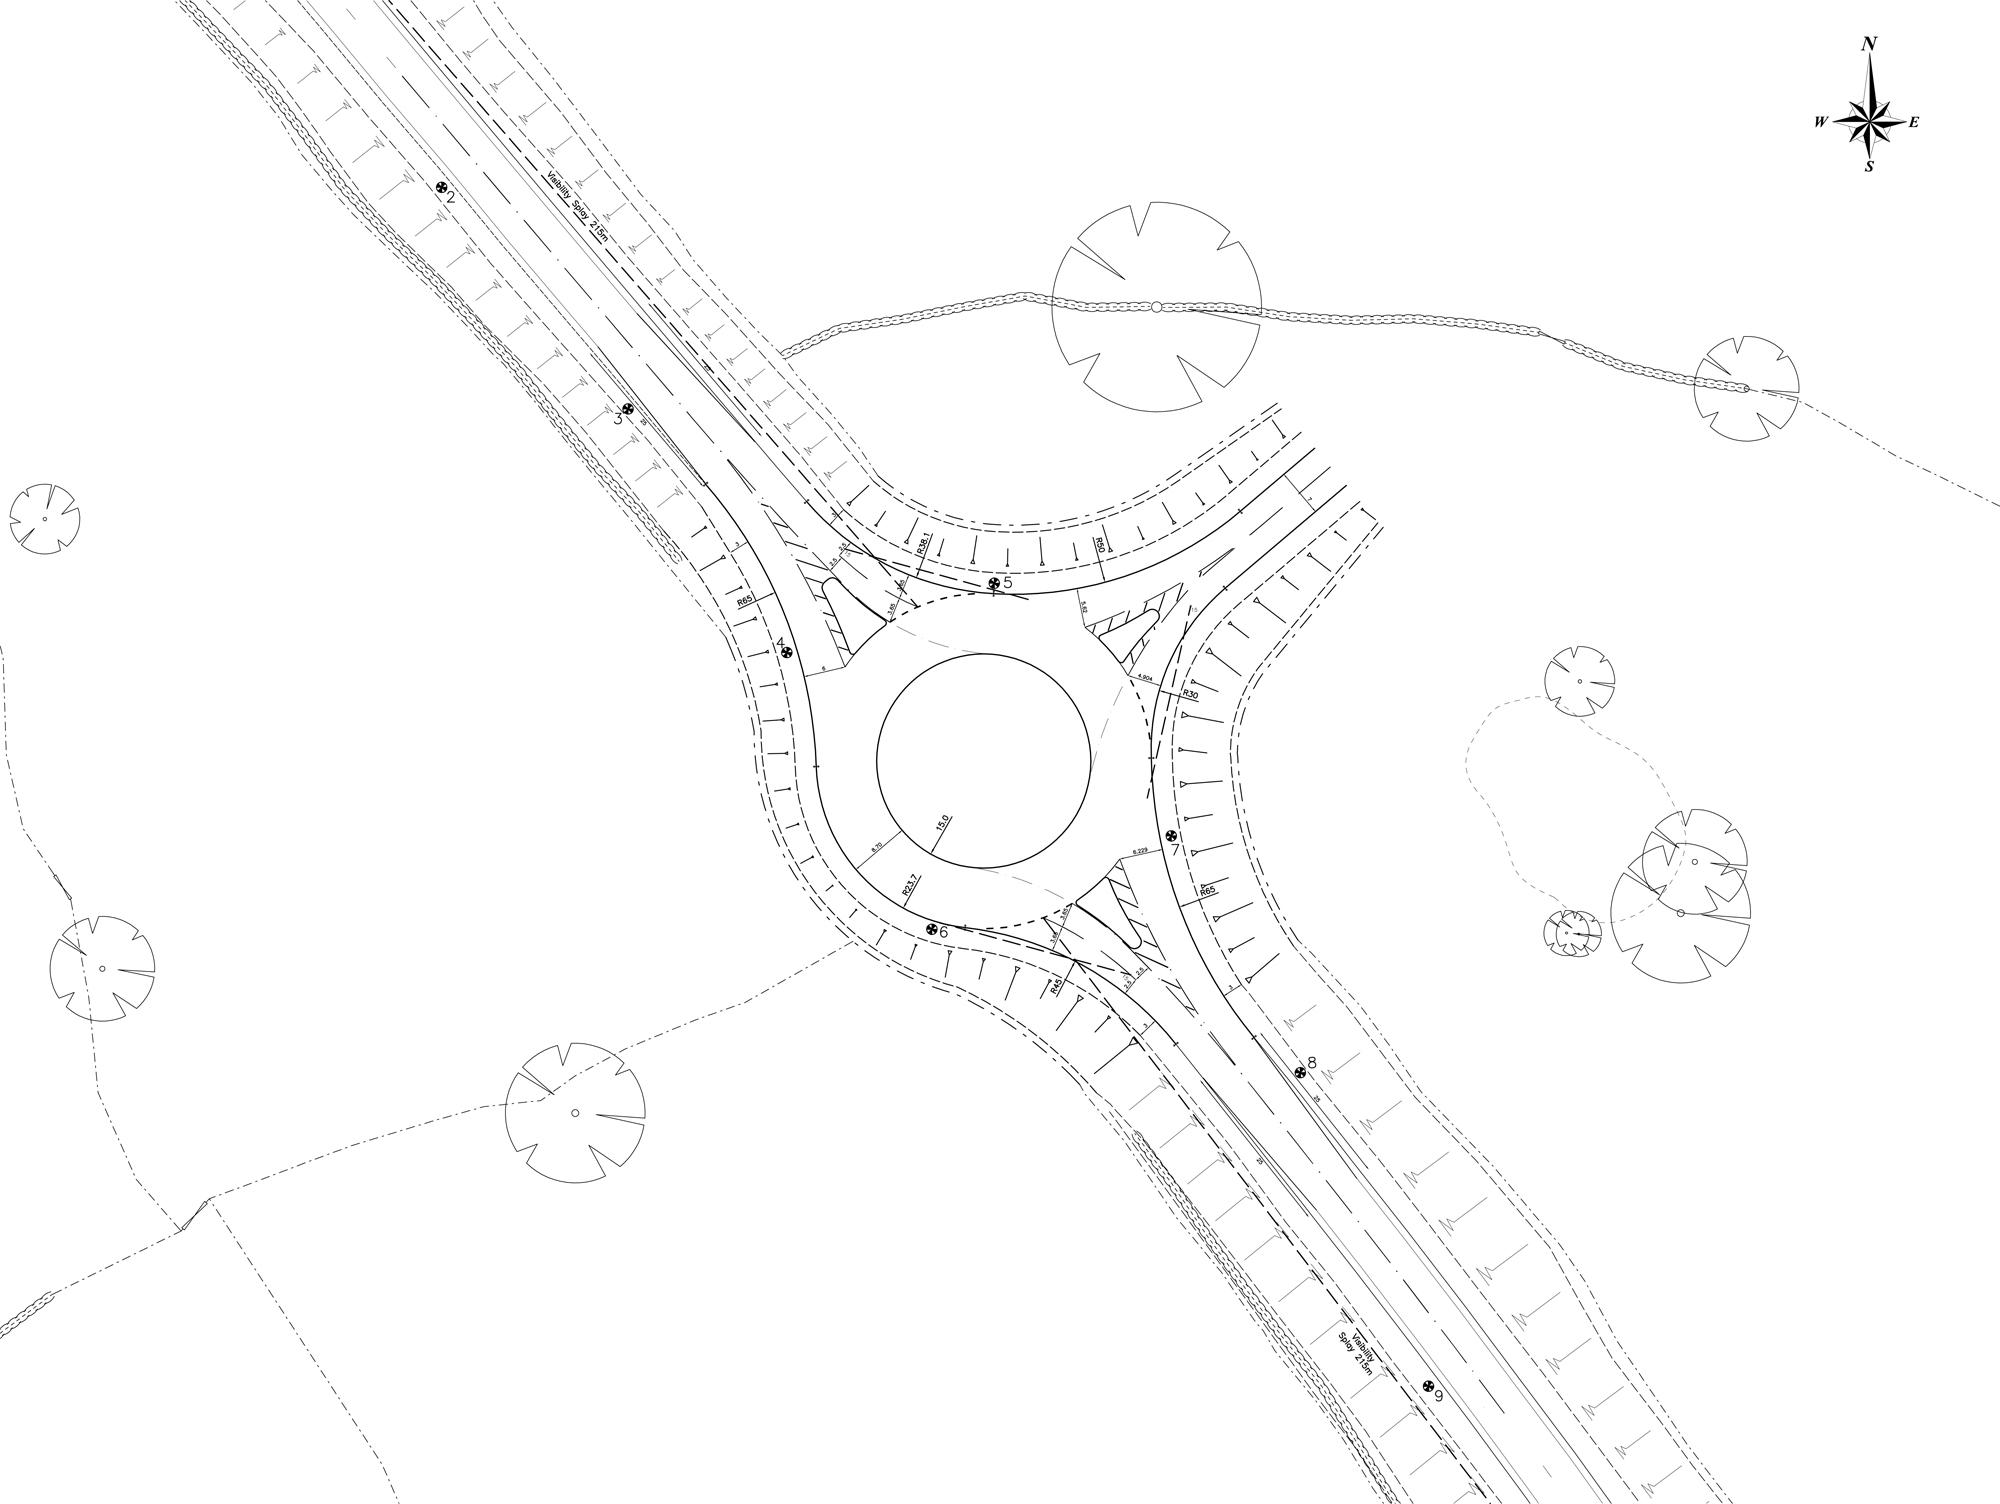 roundabout-design1